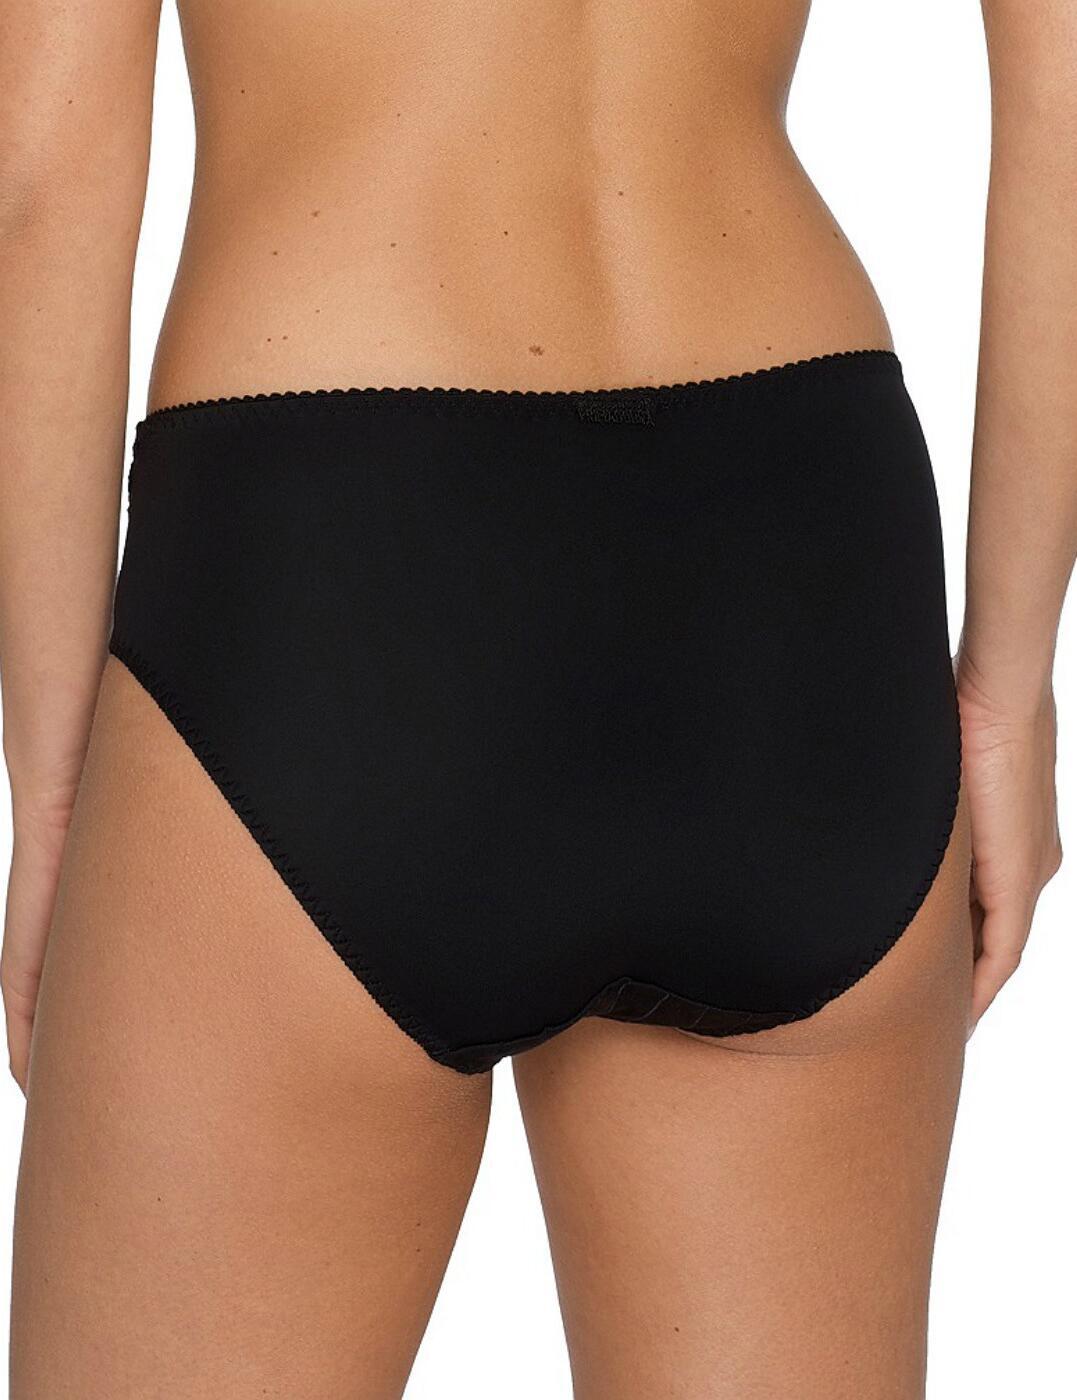 Prima-Donna-Deauville-Volle-Unterhose-Slip-Slips-Pant-0561811-Luxus-Dessous Indexbild 9